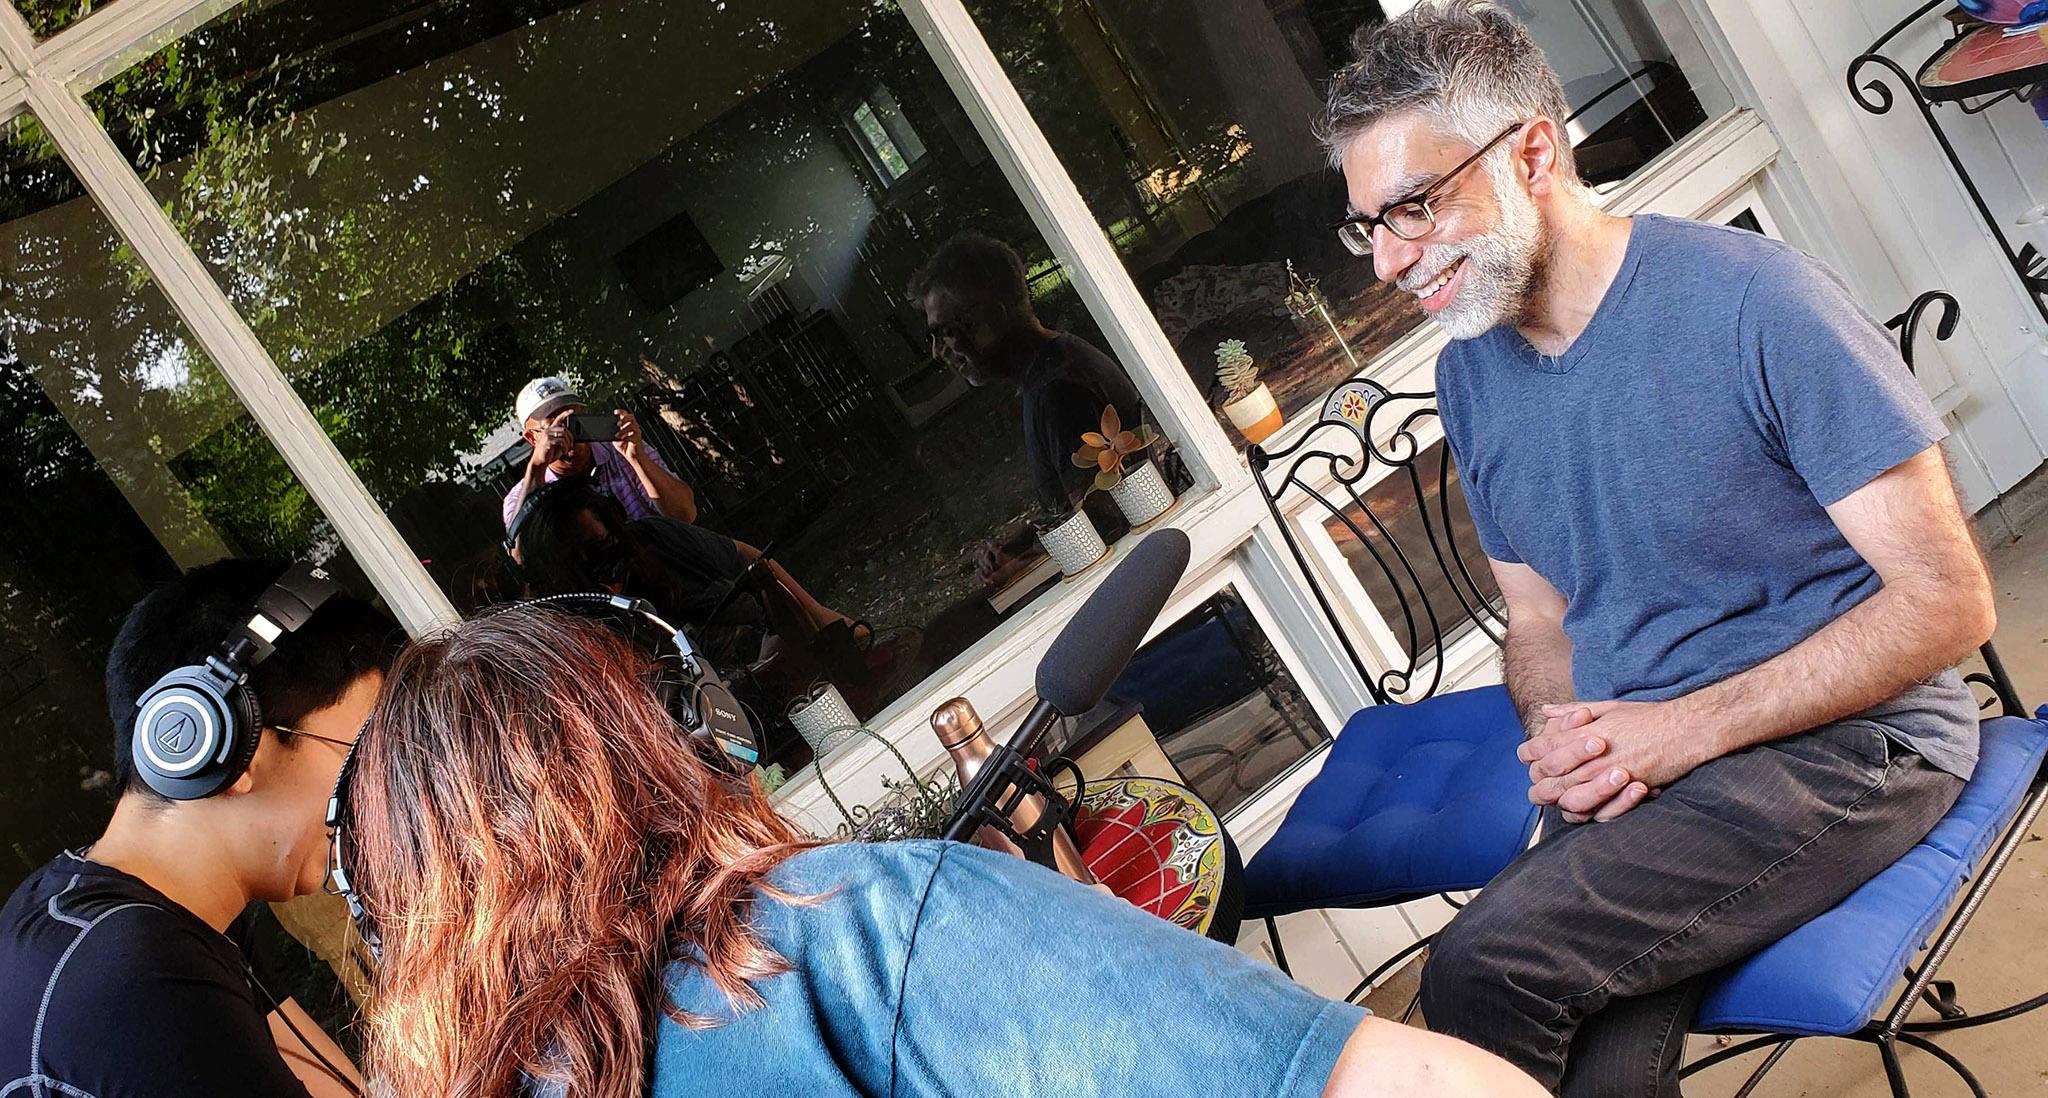 Next Generation Radio participant Ivy Winfrey interviews Filmmaker Usama Alshaibi at his home in Boulder.